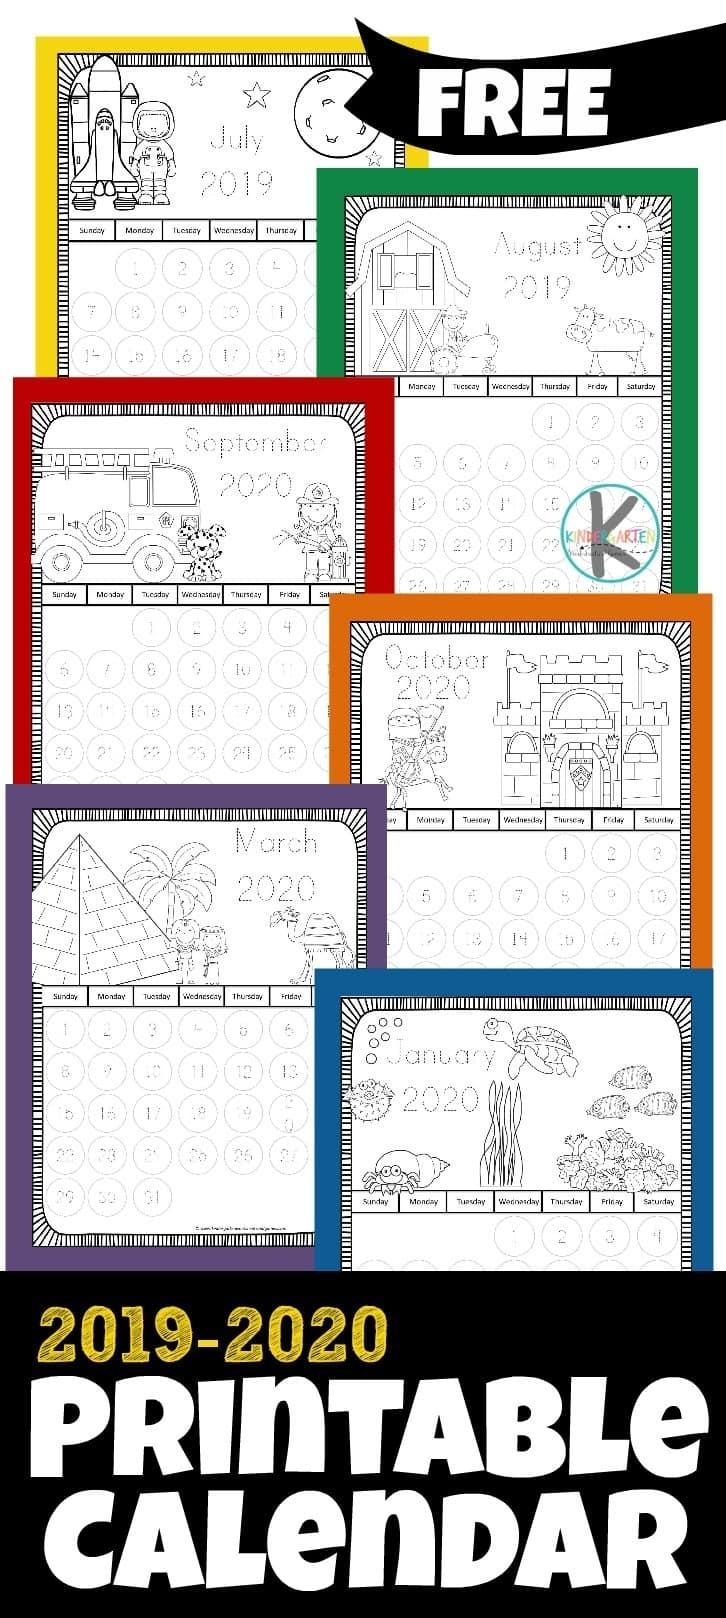 Free 2019-2020 Printable Calendar To Color – Kindergarten Worksheets intended for Printable Coloring Calendar 2020